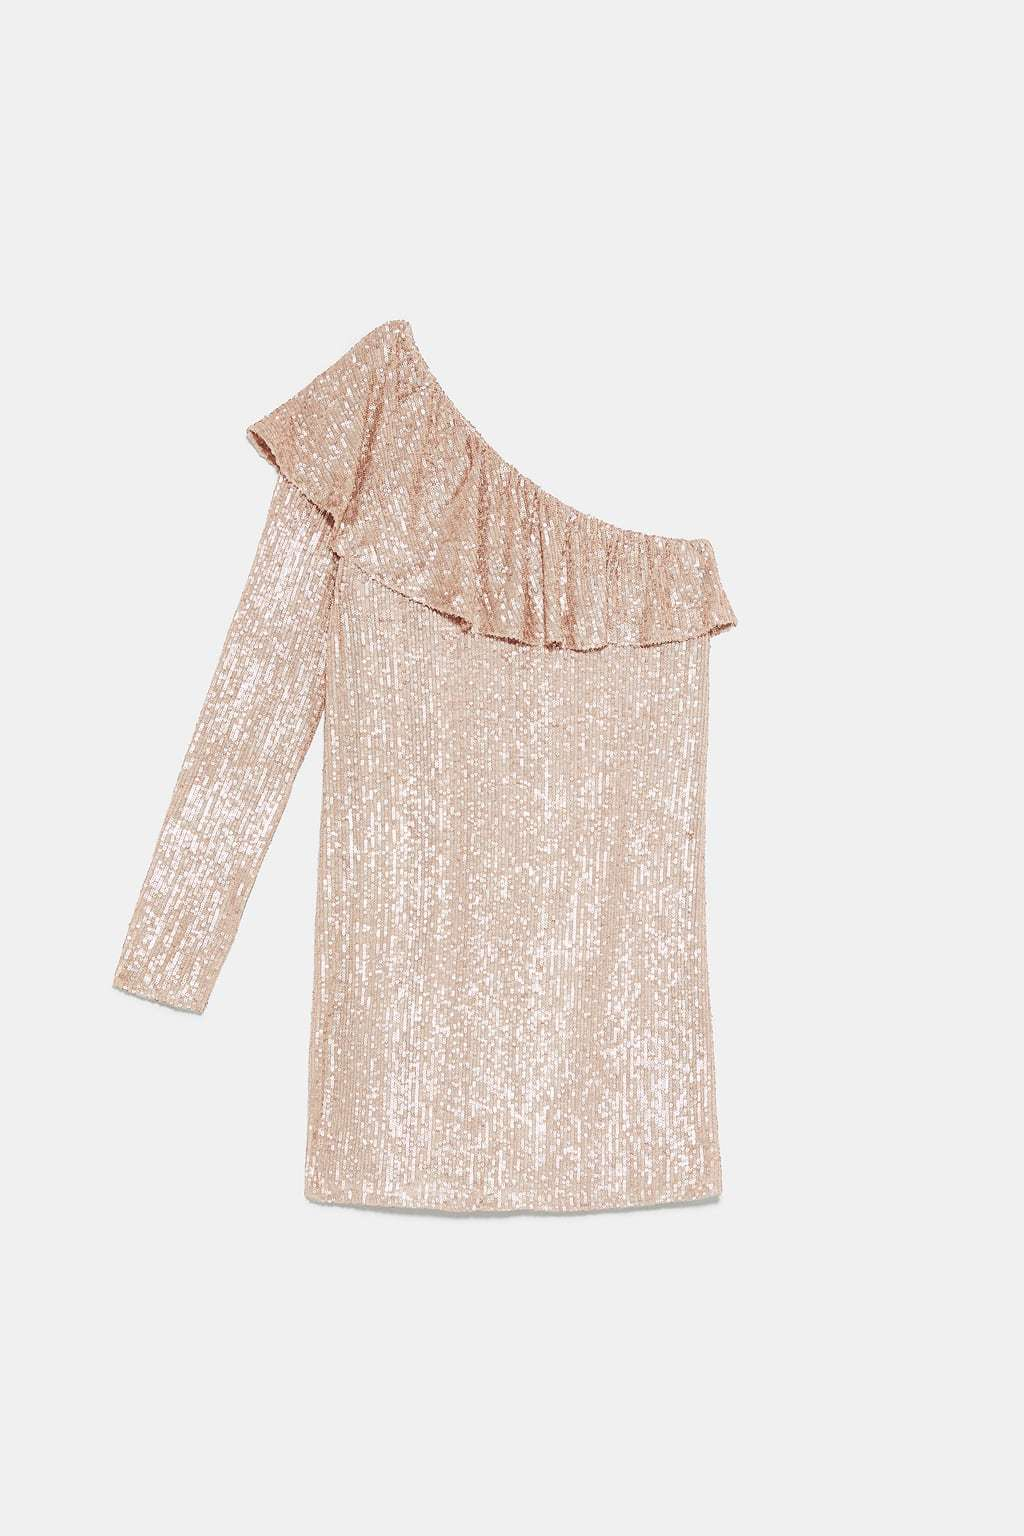 Vestido asimétrico de lentejuelas en color salmón de Zara